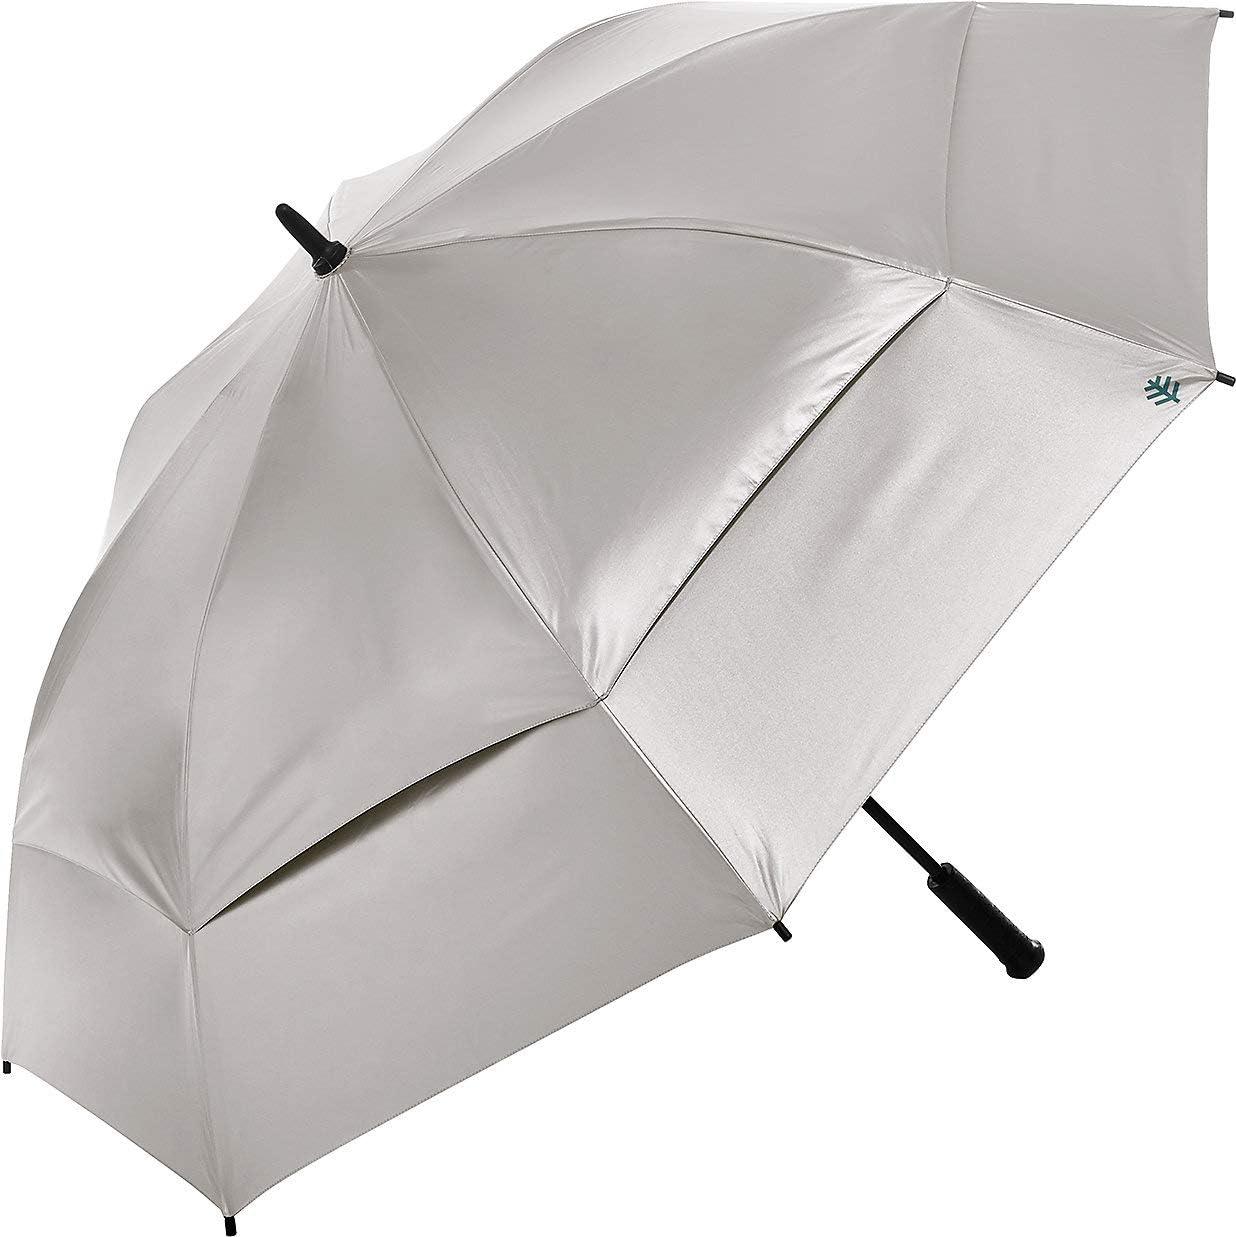 Coolibar UPF 50+ 62 Inch Tournament Protecti - Fort Worth Mall Golf Sun Umbrella El Paso Mall